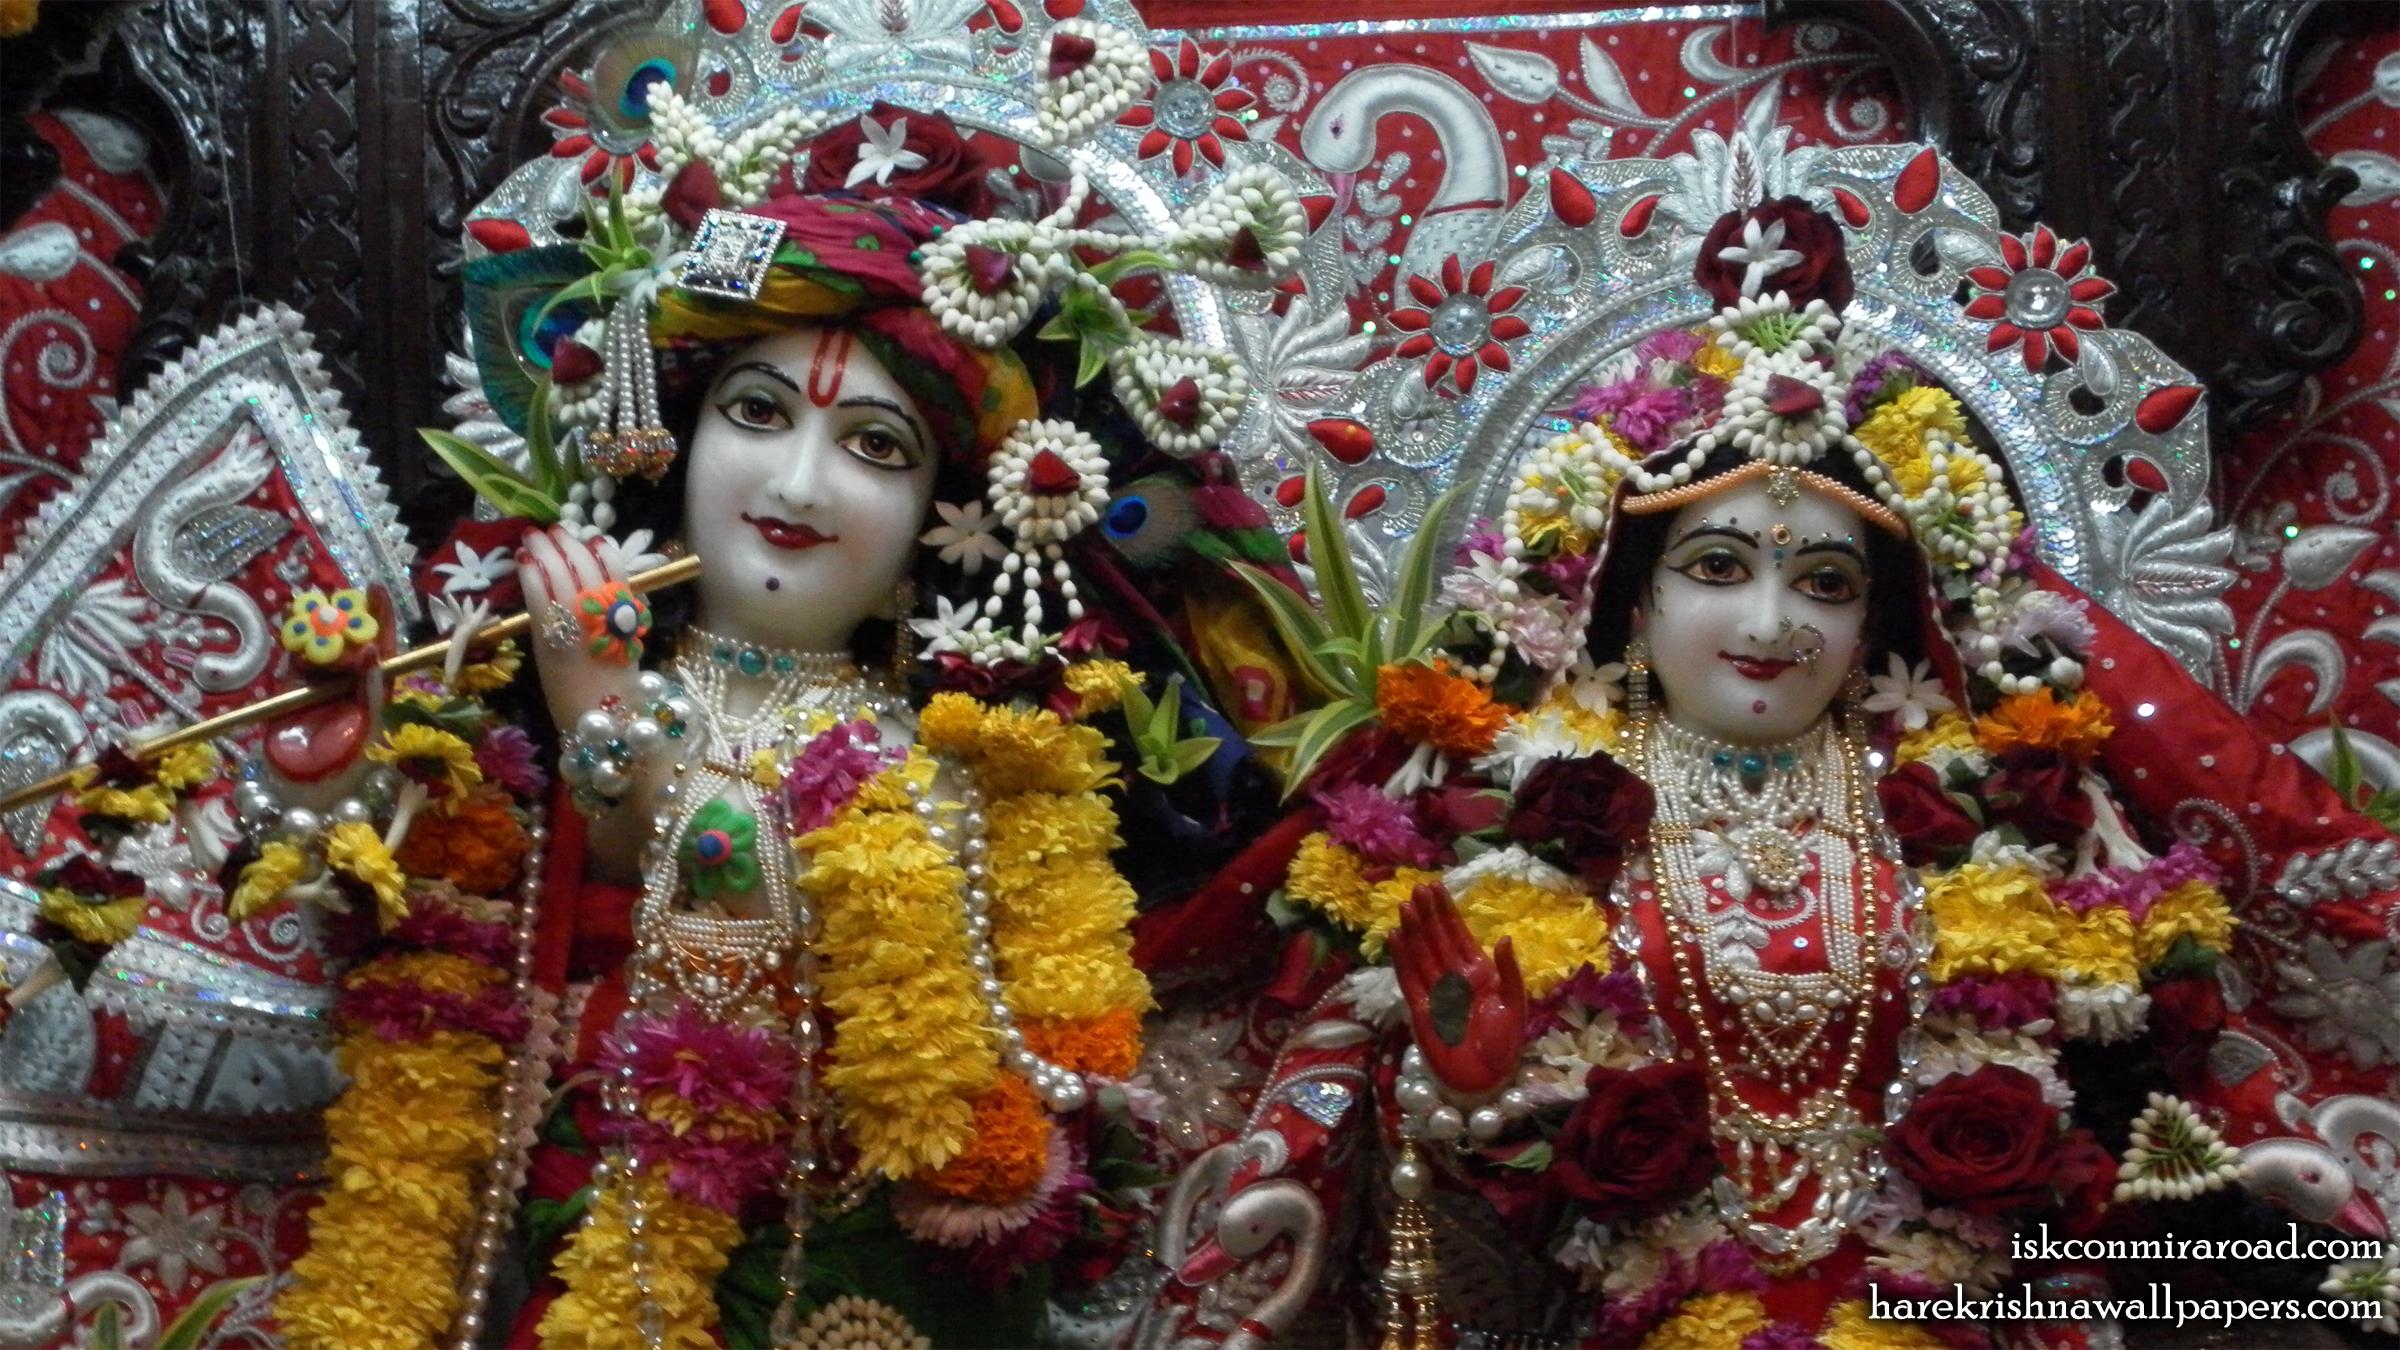 Sri Sri Radha Giridhari Close up Wallpaper (021) Size 2400x1350 Download